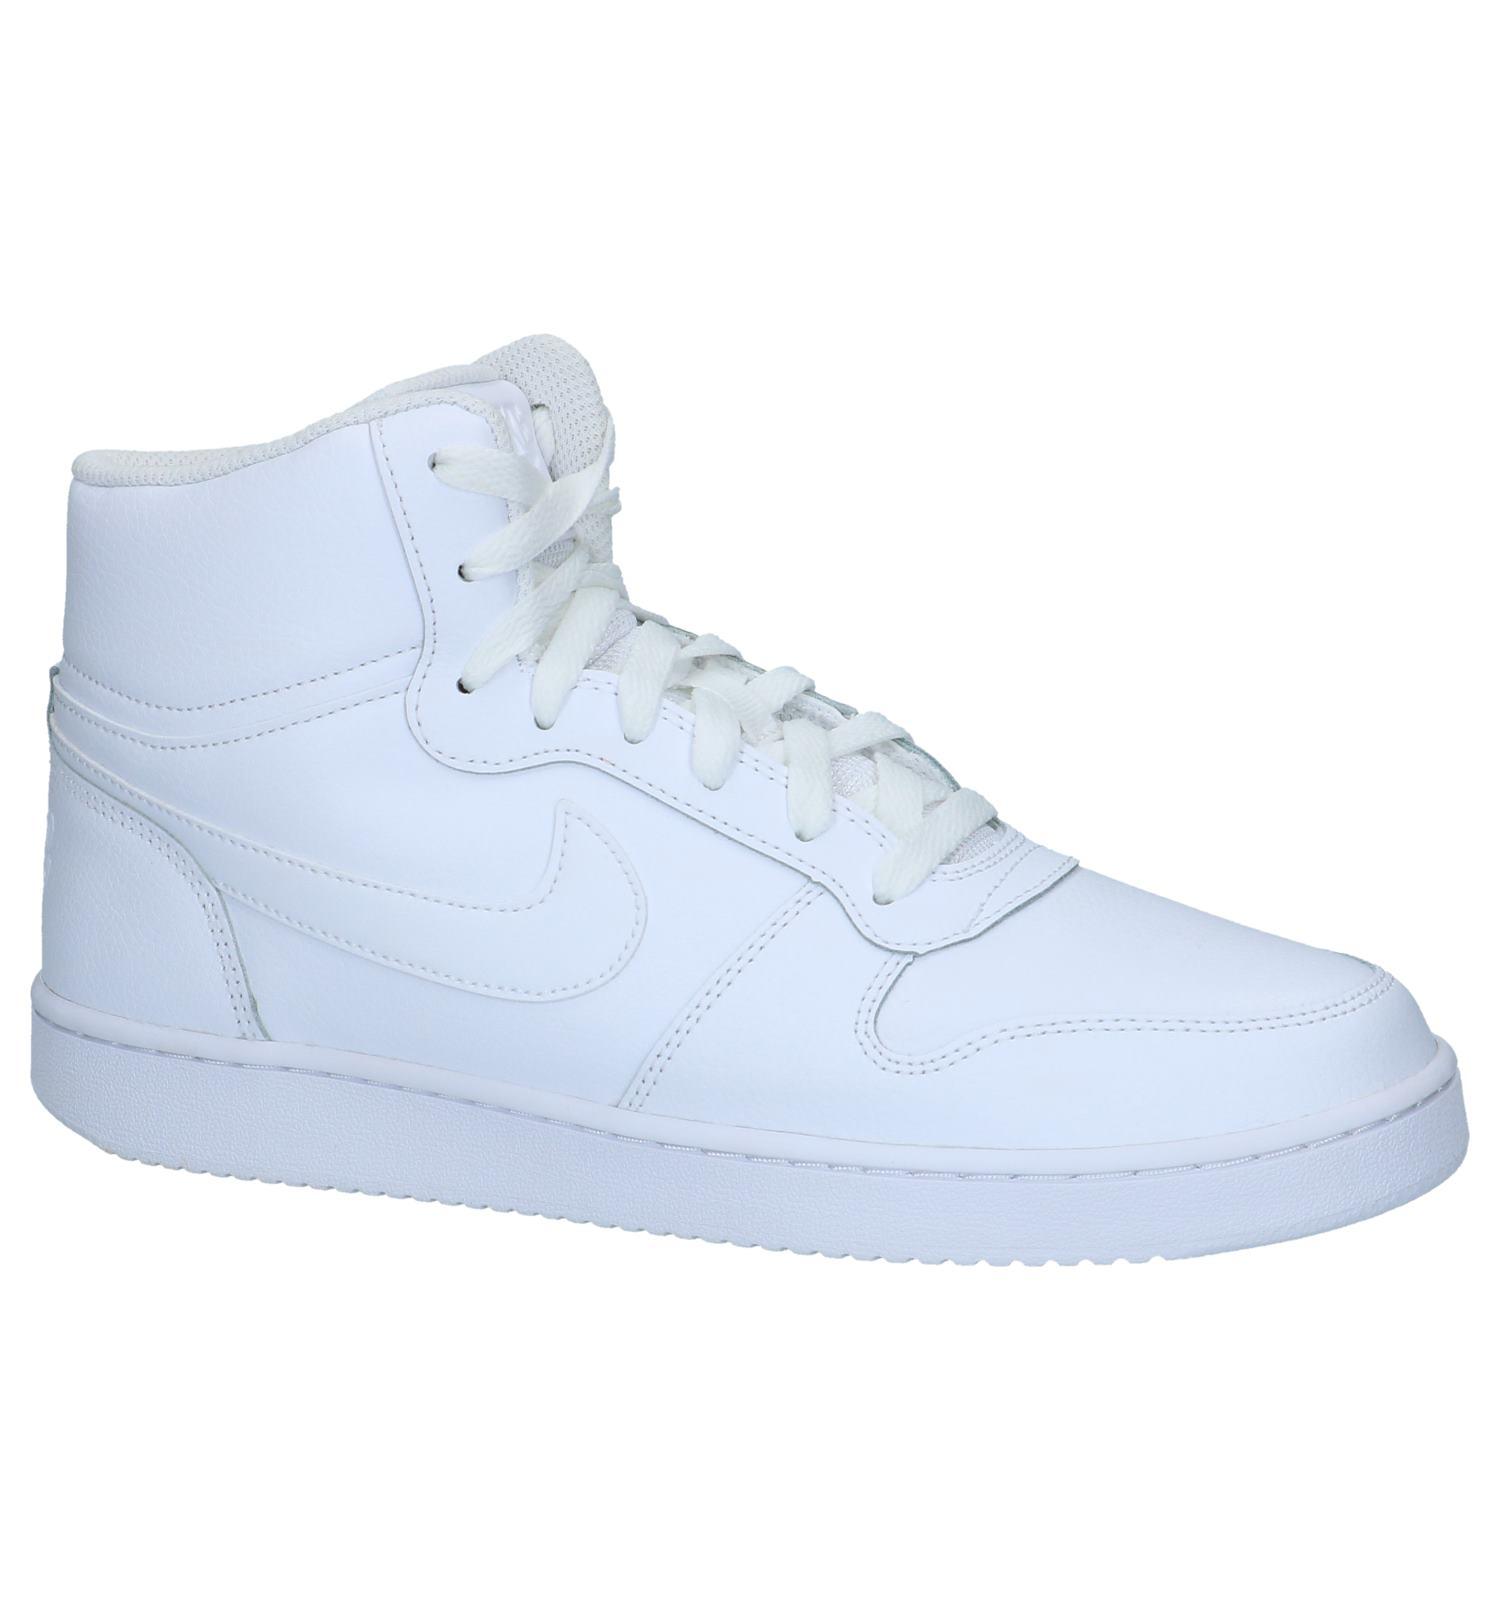 a607659e62b Witte Nike Ebernon Sneakers Hoog | TORFS.BE | Gratis verzend en retour